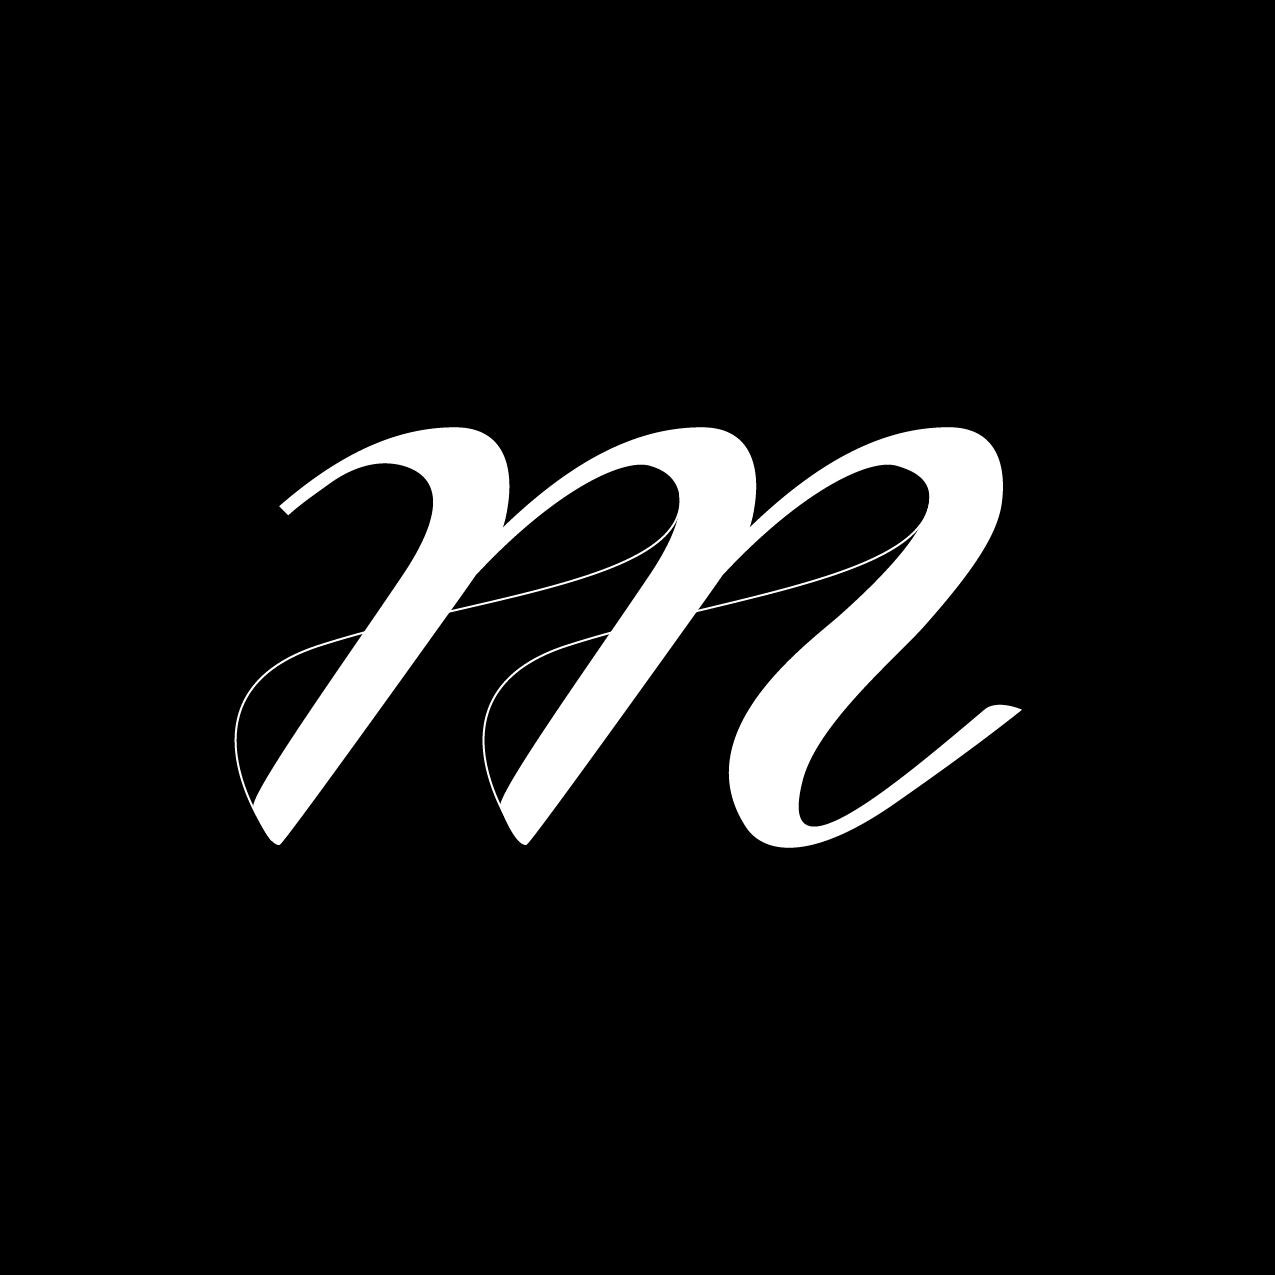 Letter M4 Design by Furia